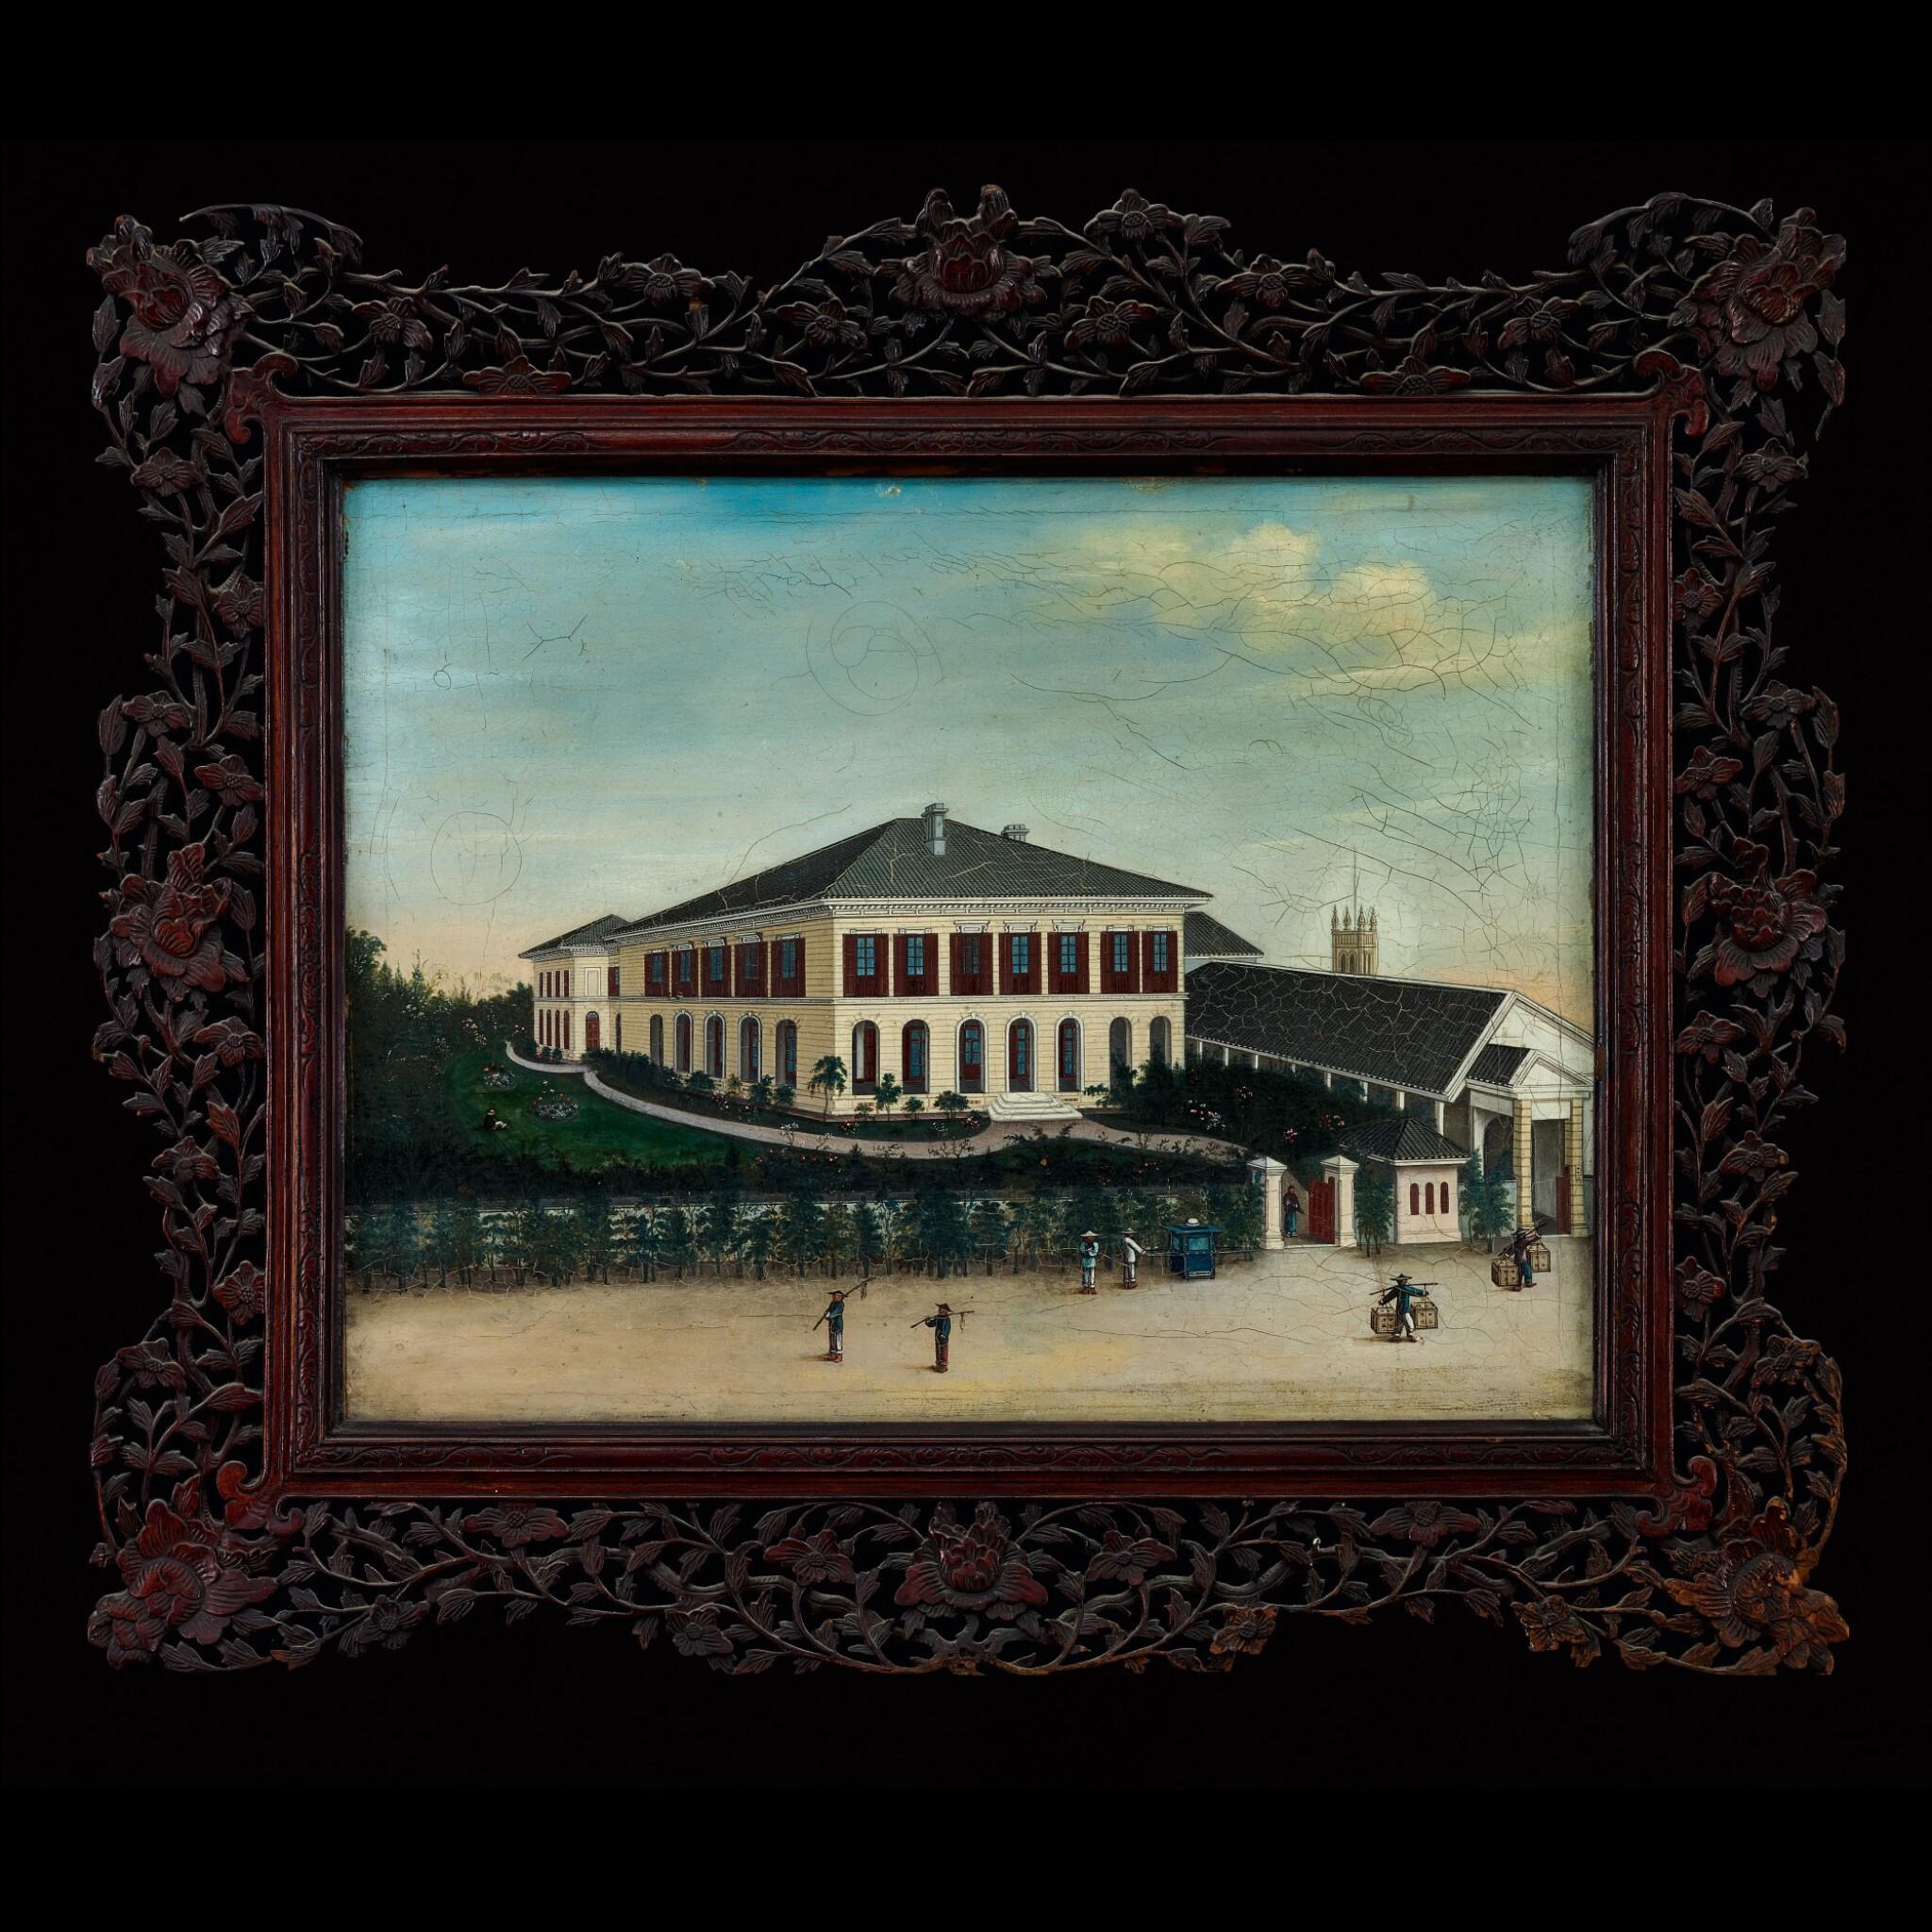 View full screen - View 1 of Lot 180. Chowkwa (fl. 1850-1880) or His Studio, circa 1860-1865 Foreign Establishment on the Bund at Shanghai | 周呱(活躍於1850-1880年)或其工作室 約1860-1865年  上海外灘外國商館圖 布本油畫 鏡框.